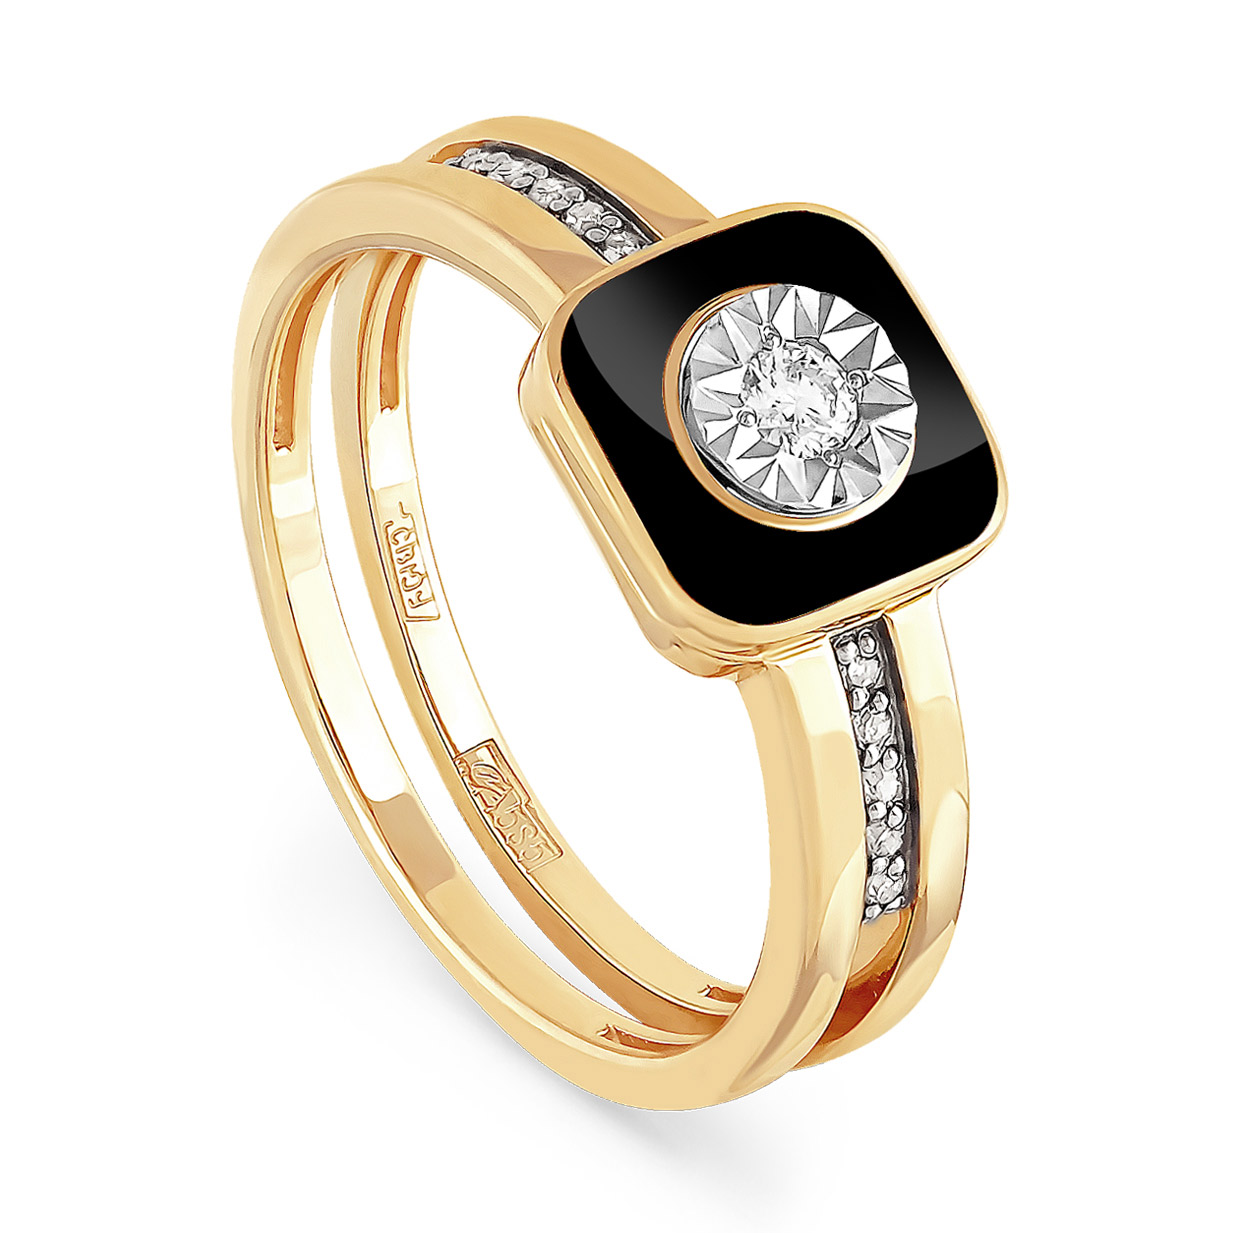 Кольцо из лимонного золота Бриллиант арт. 11-2804-1002 11-2804-1002